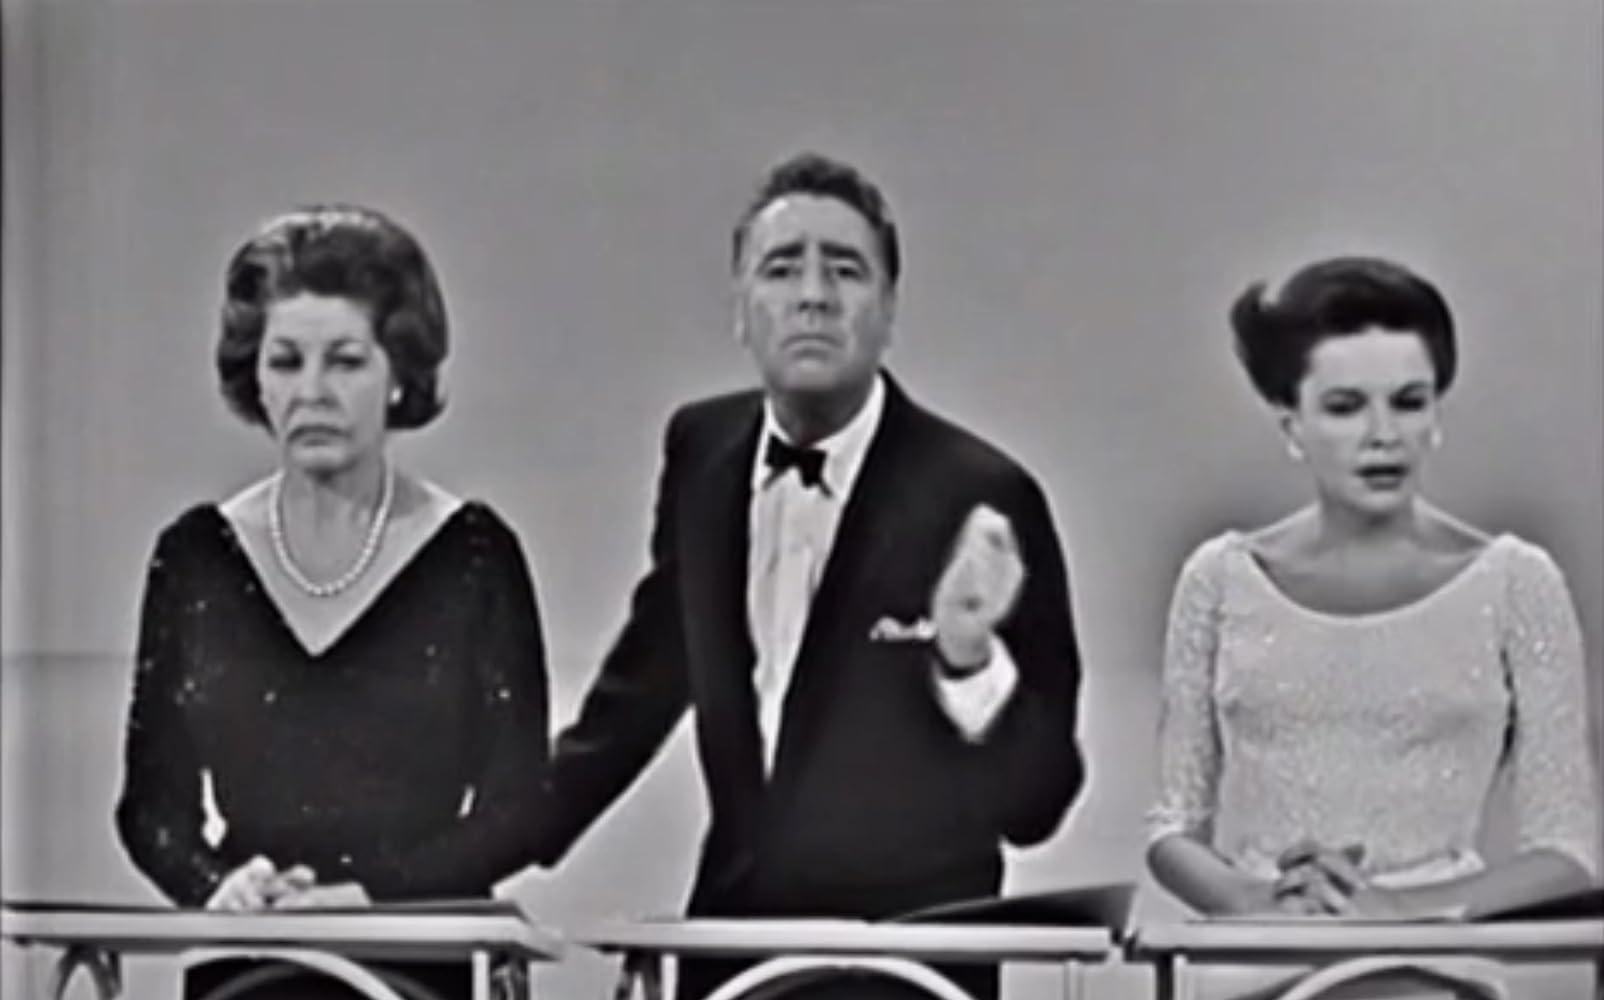 Episode #1.17 (1964)